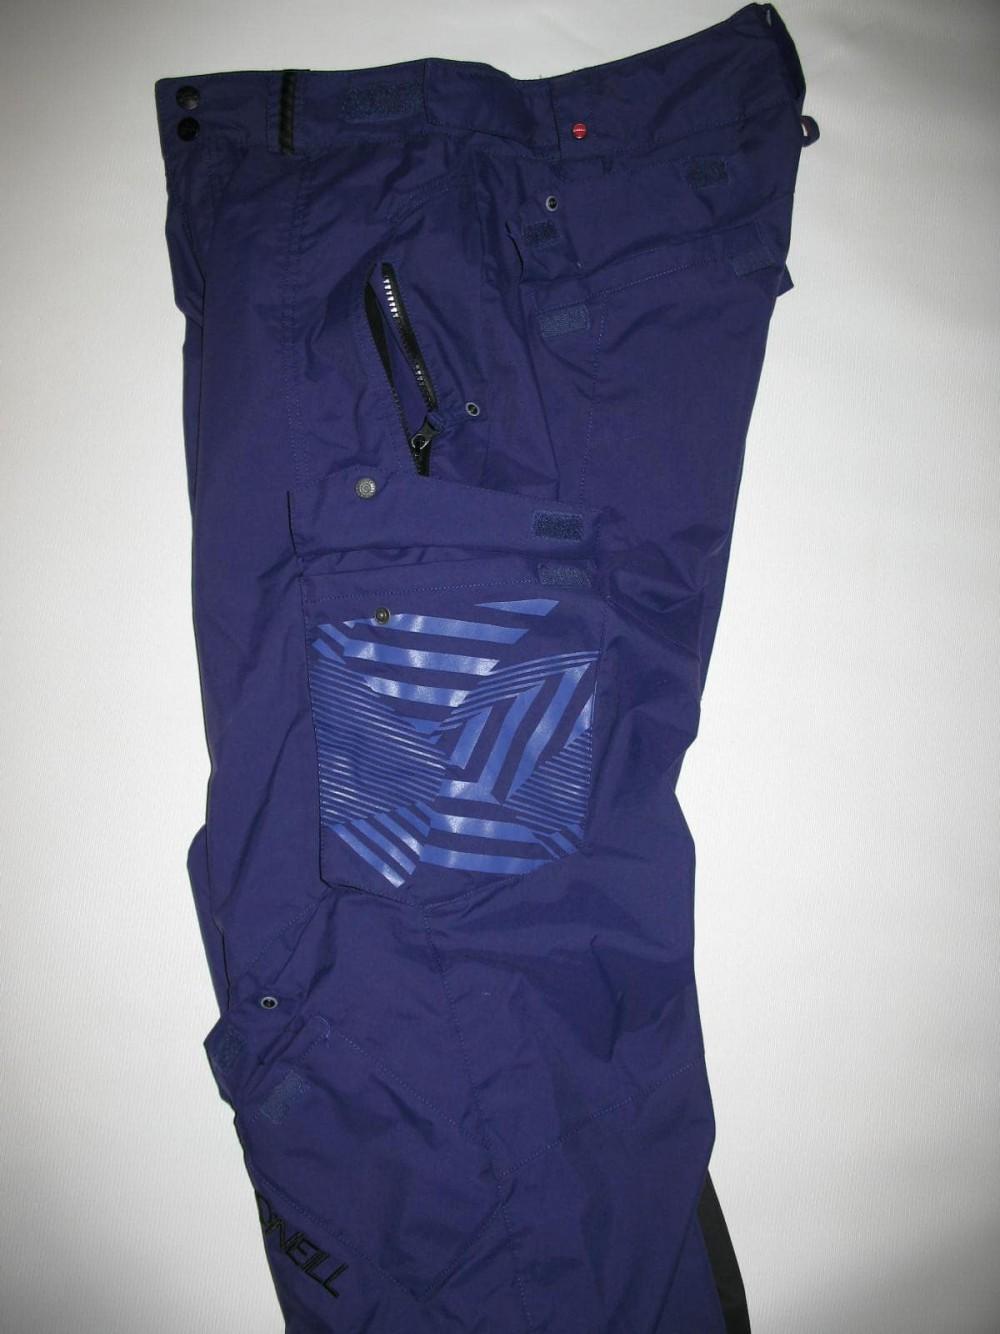 Штаны O'NEILL 10/10 snowboard pants (размер S) - 4